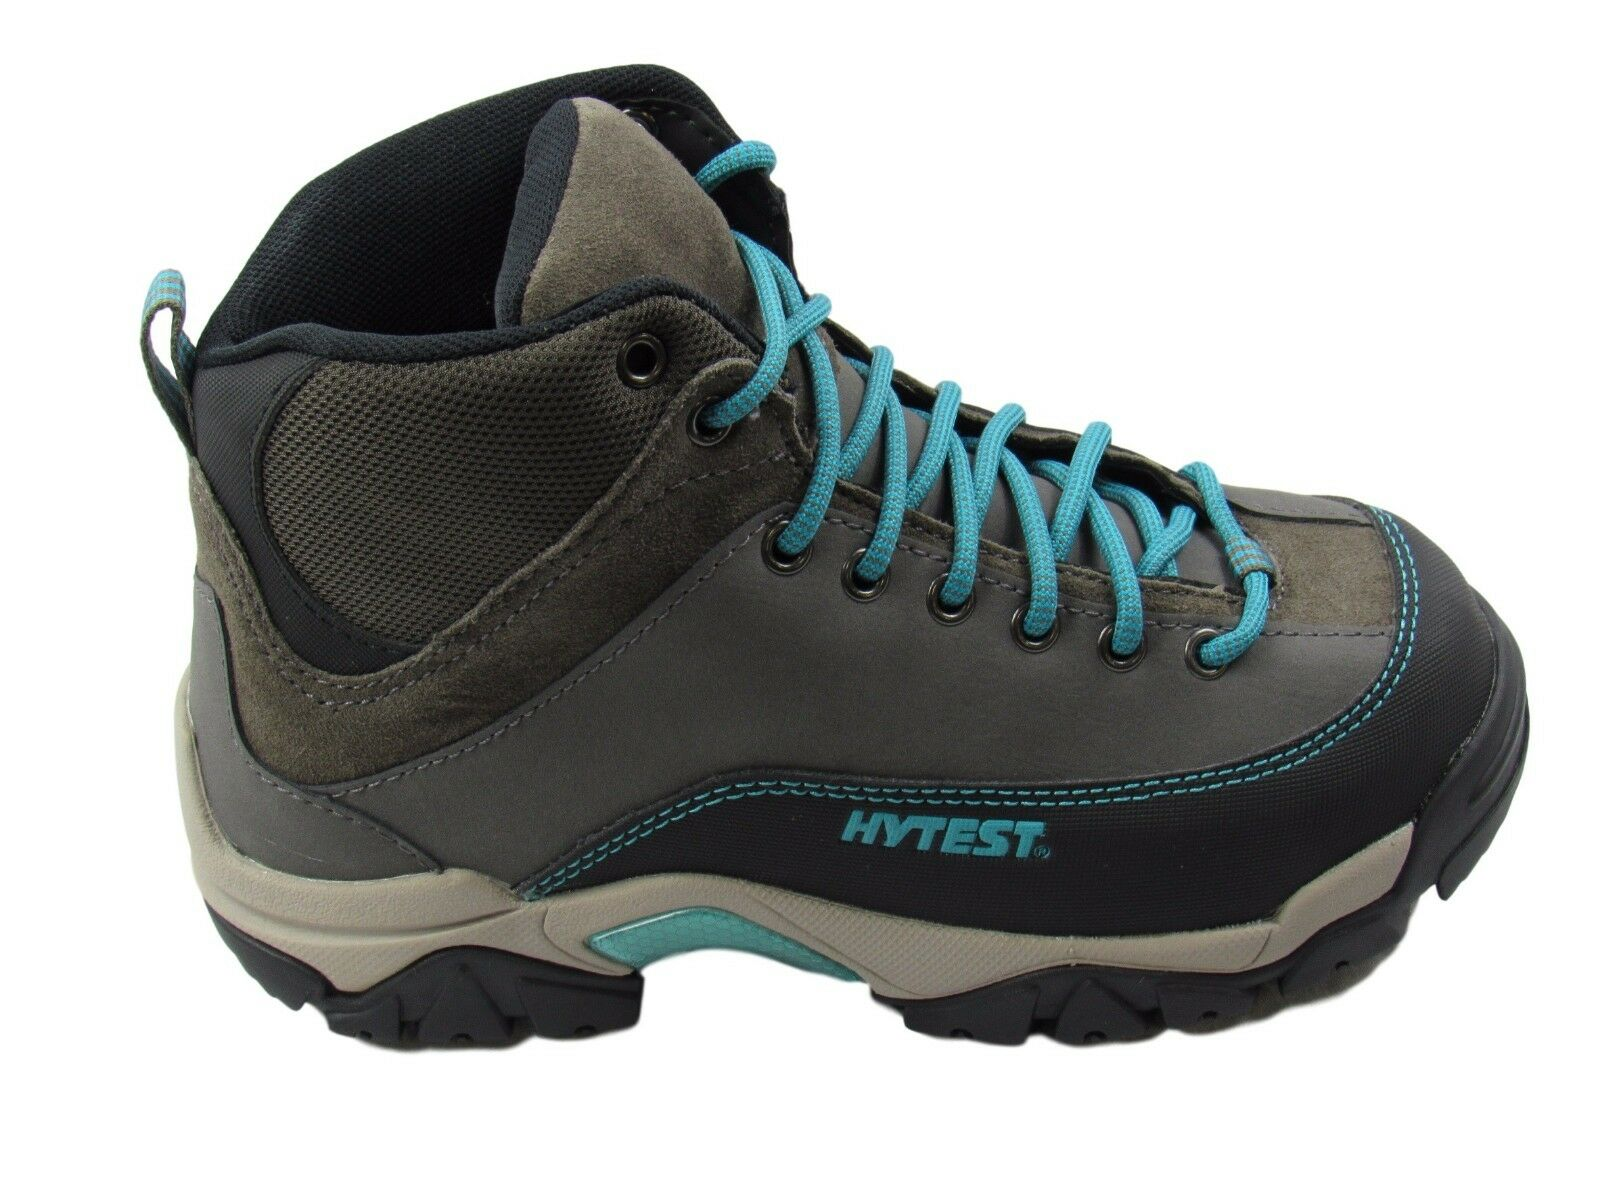 Hytest damen Apex Hiker Steel Toe Safety Safety Safety schuhe Slip and Oil Resistant Sz 6.5 W 0e8ecf